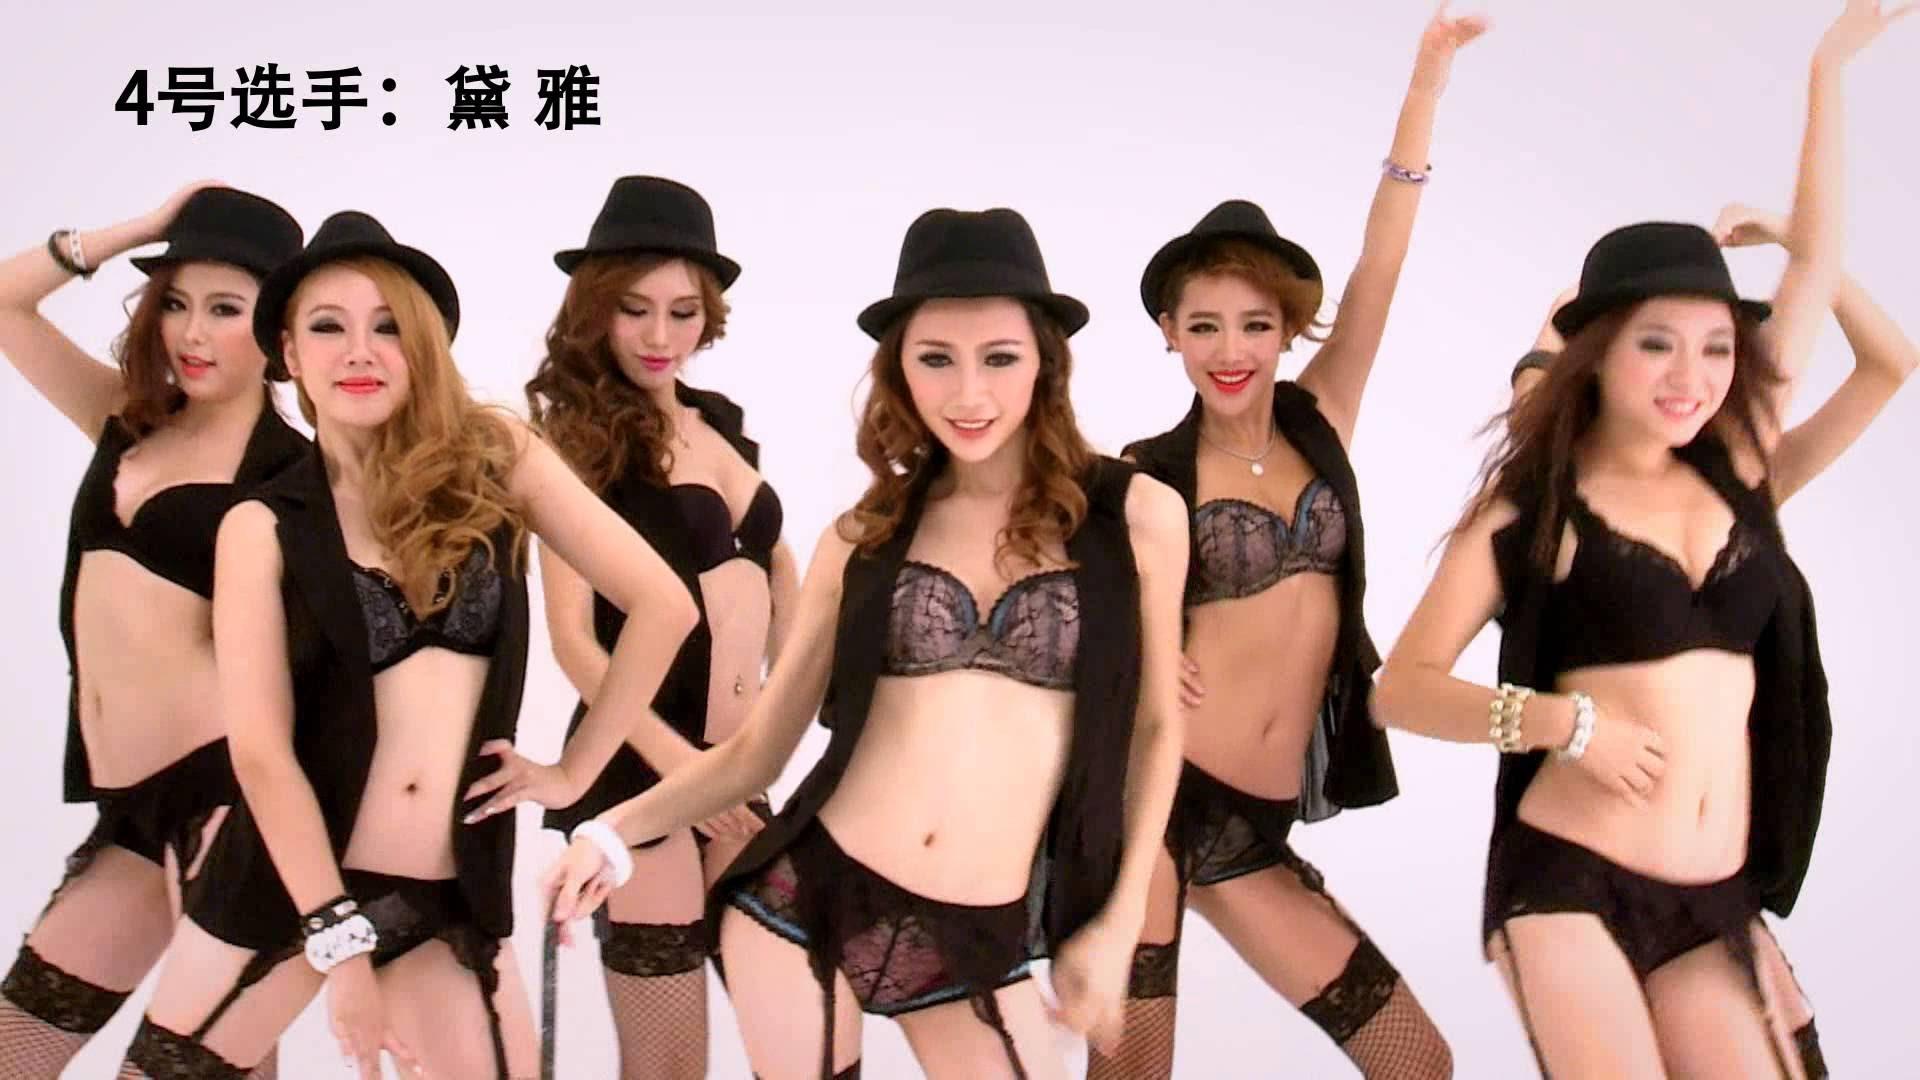 HQ Girls Generation Wallpapers | File 159.13Kb